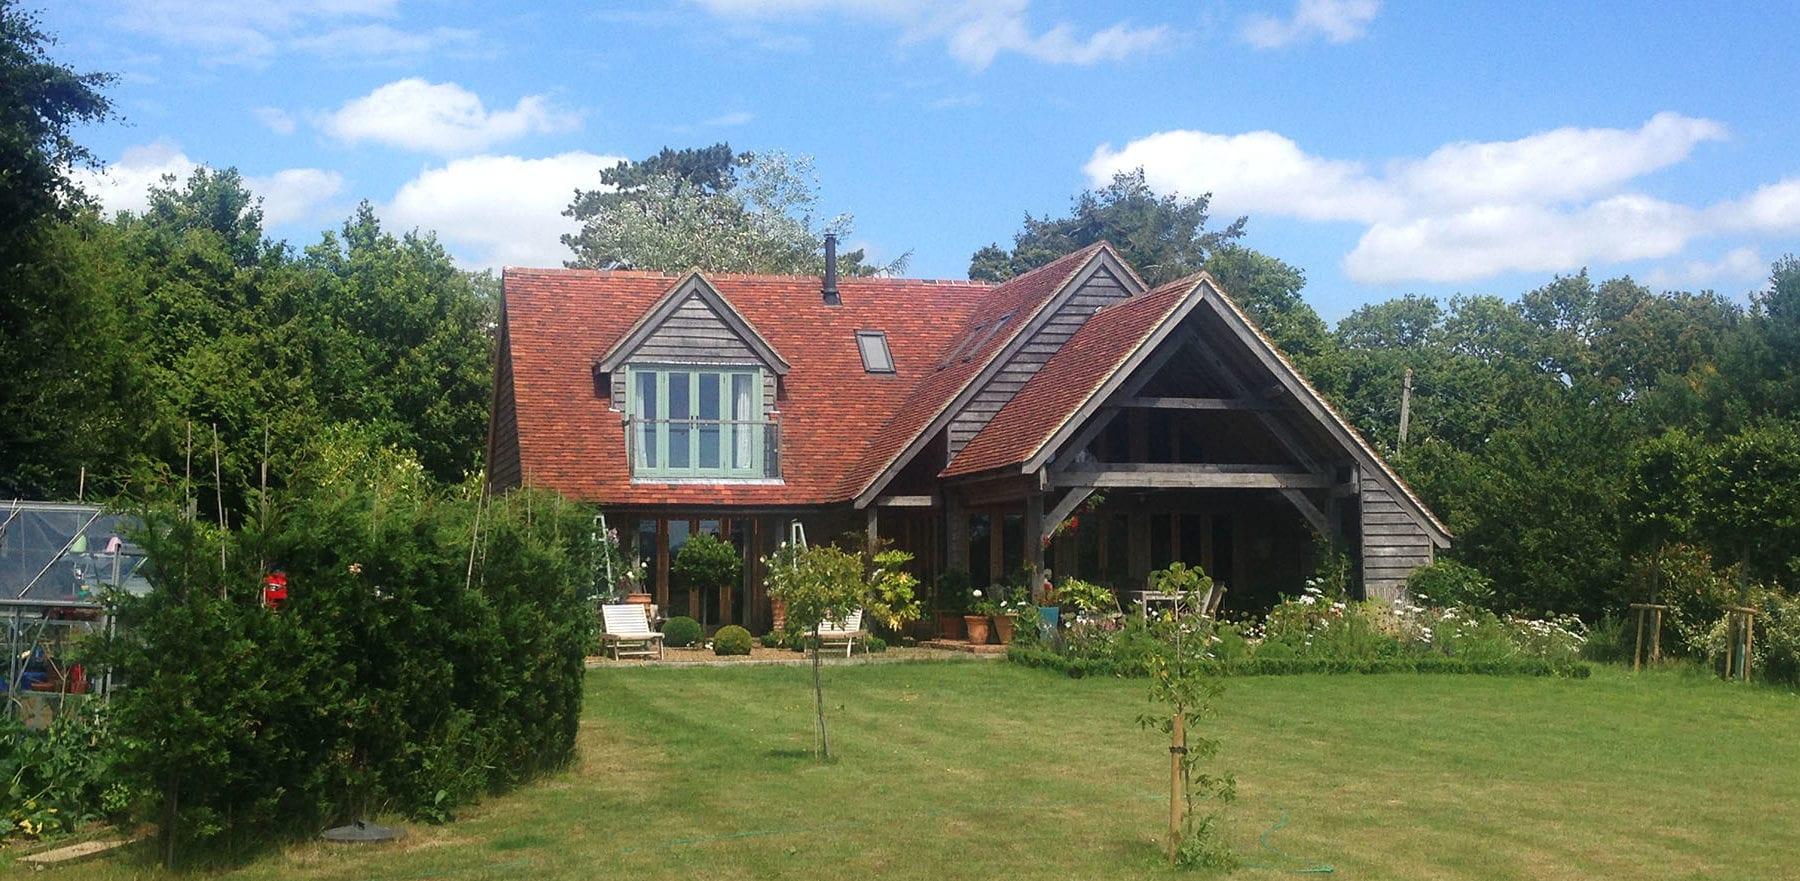 Lifestiles - Handmade Multi Clay Roof Tiles - Stephen Evans Architect, England 2